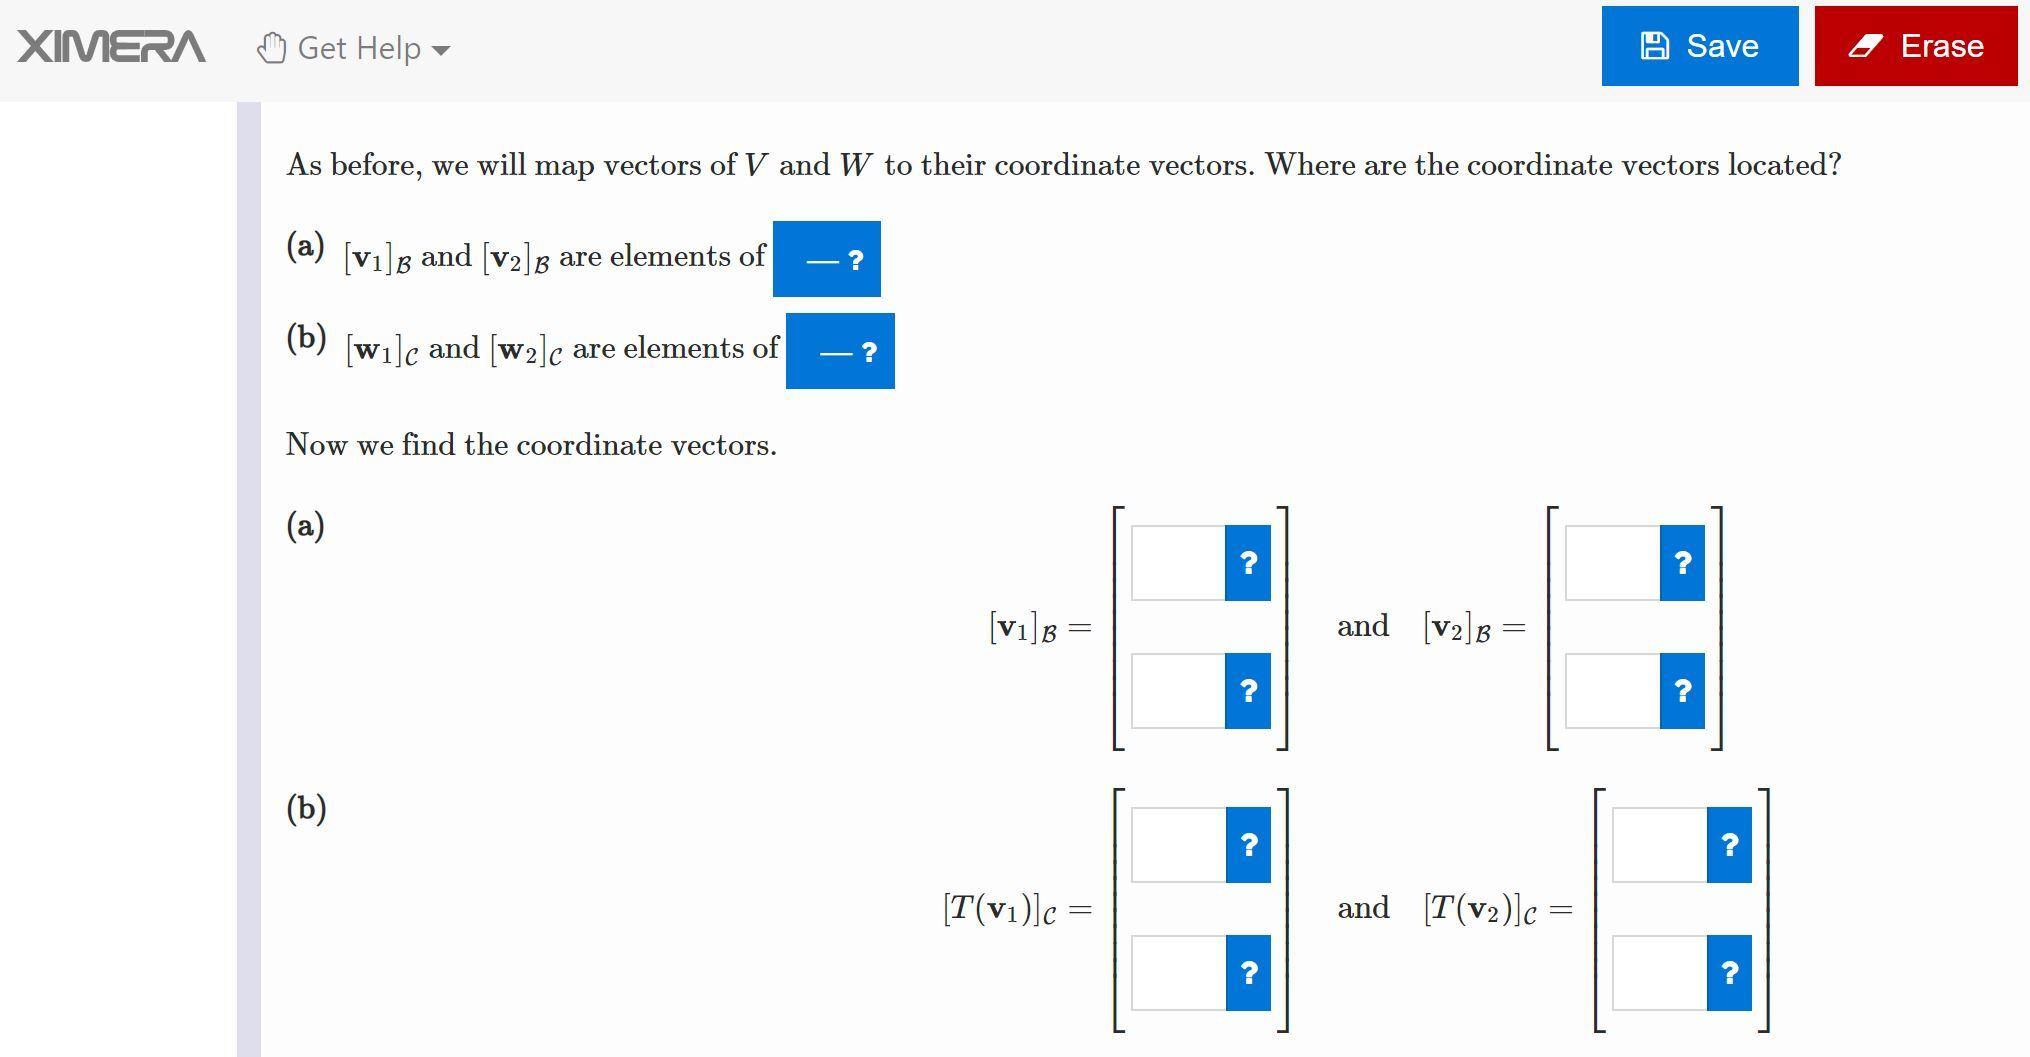 XIMERA screenshot of multiple choice question